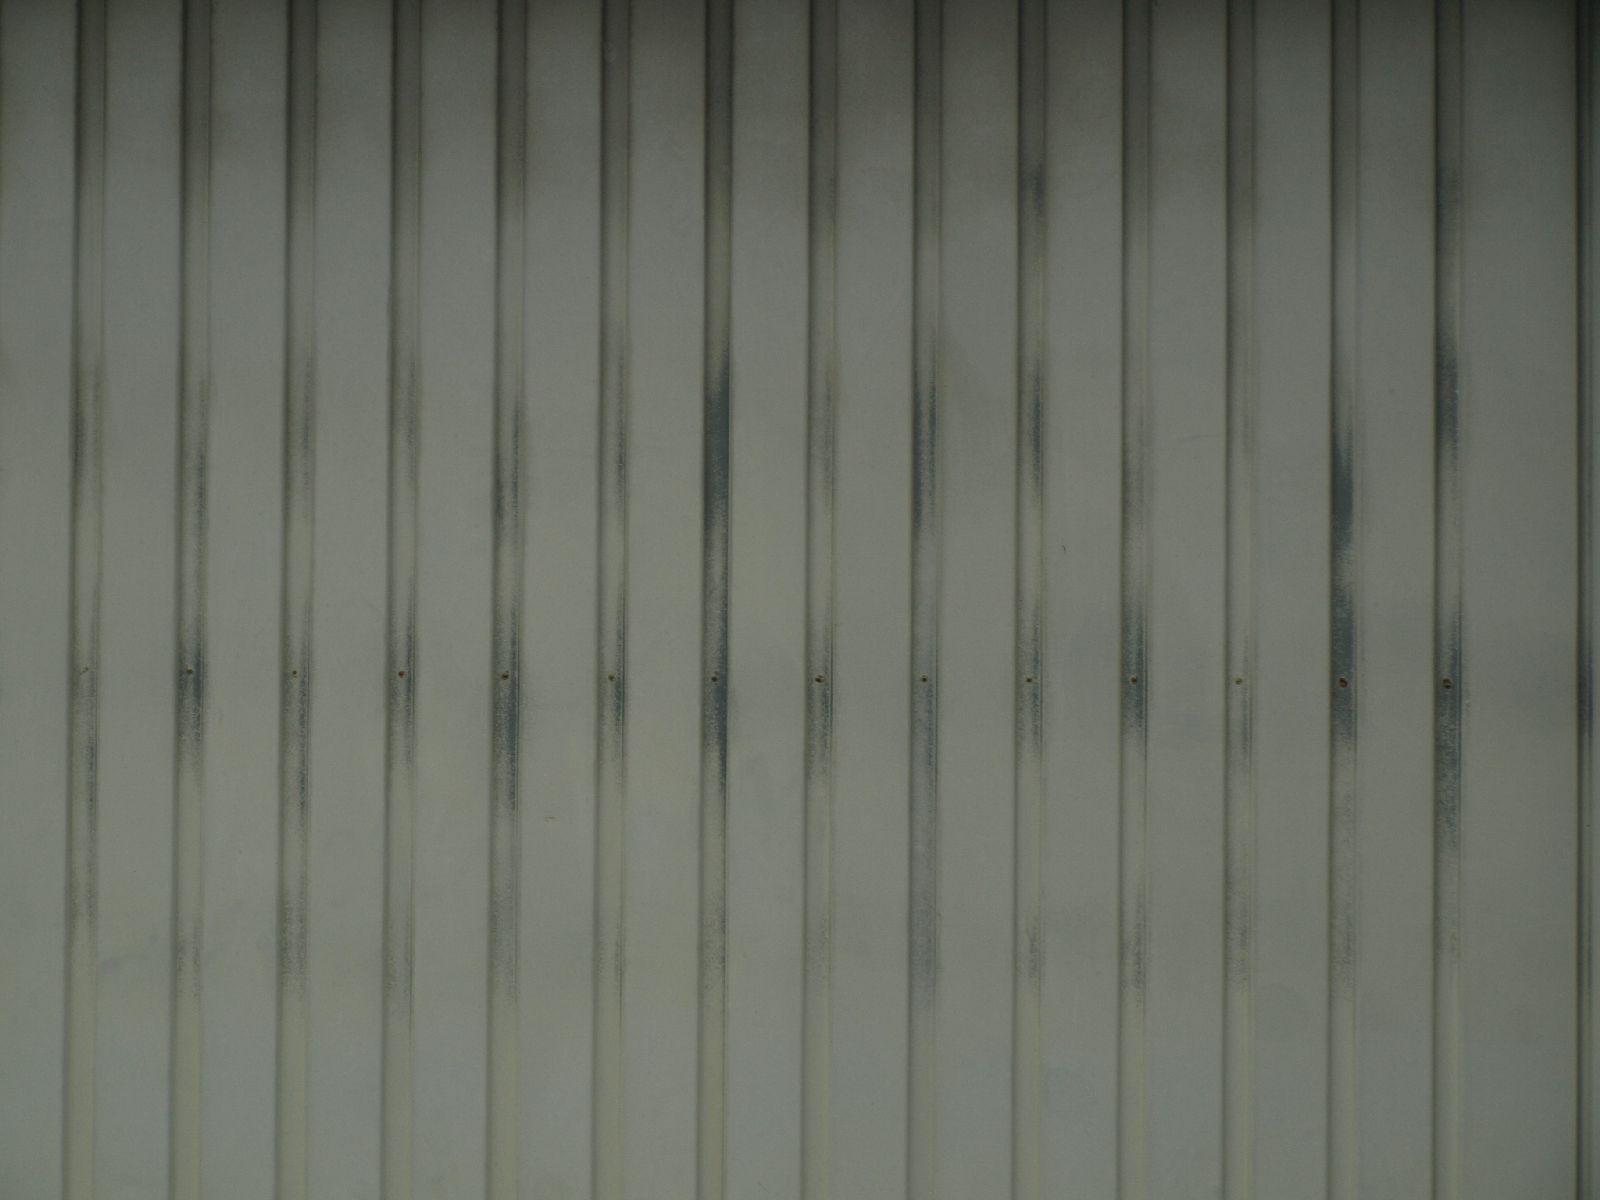 Metall_Textur_A_PC258244